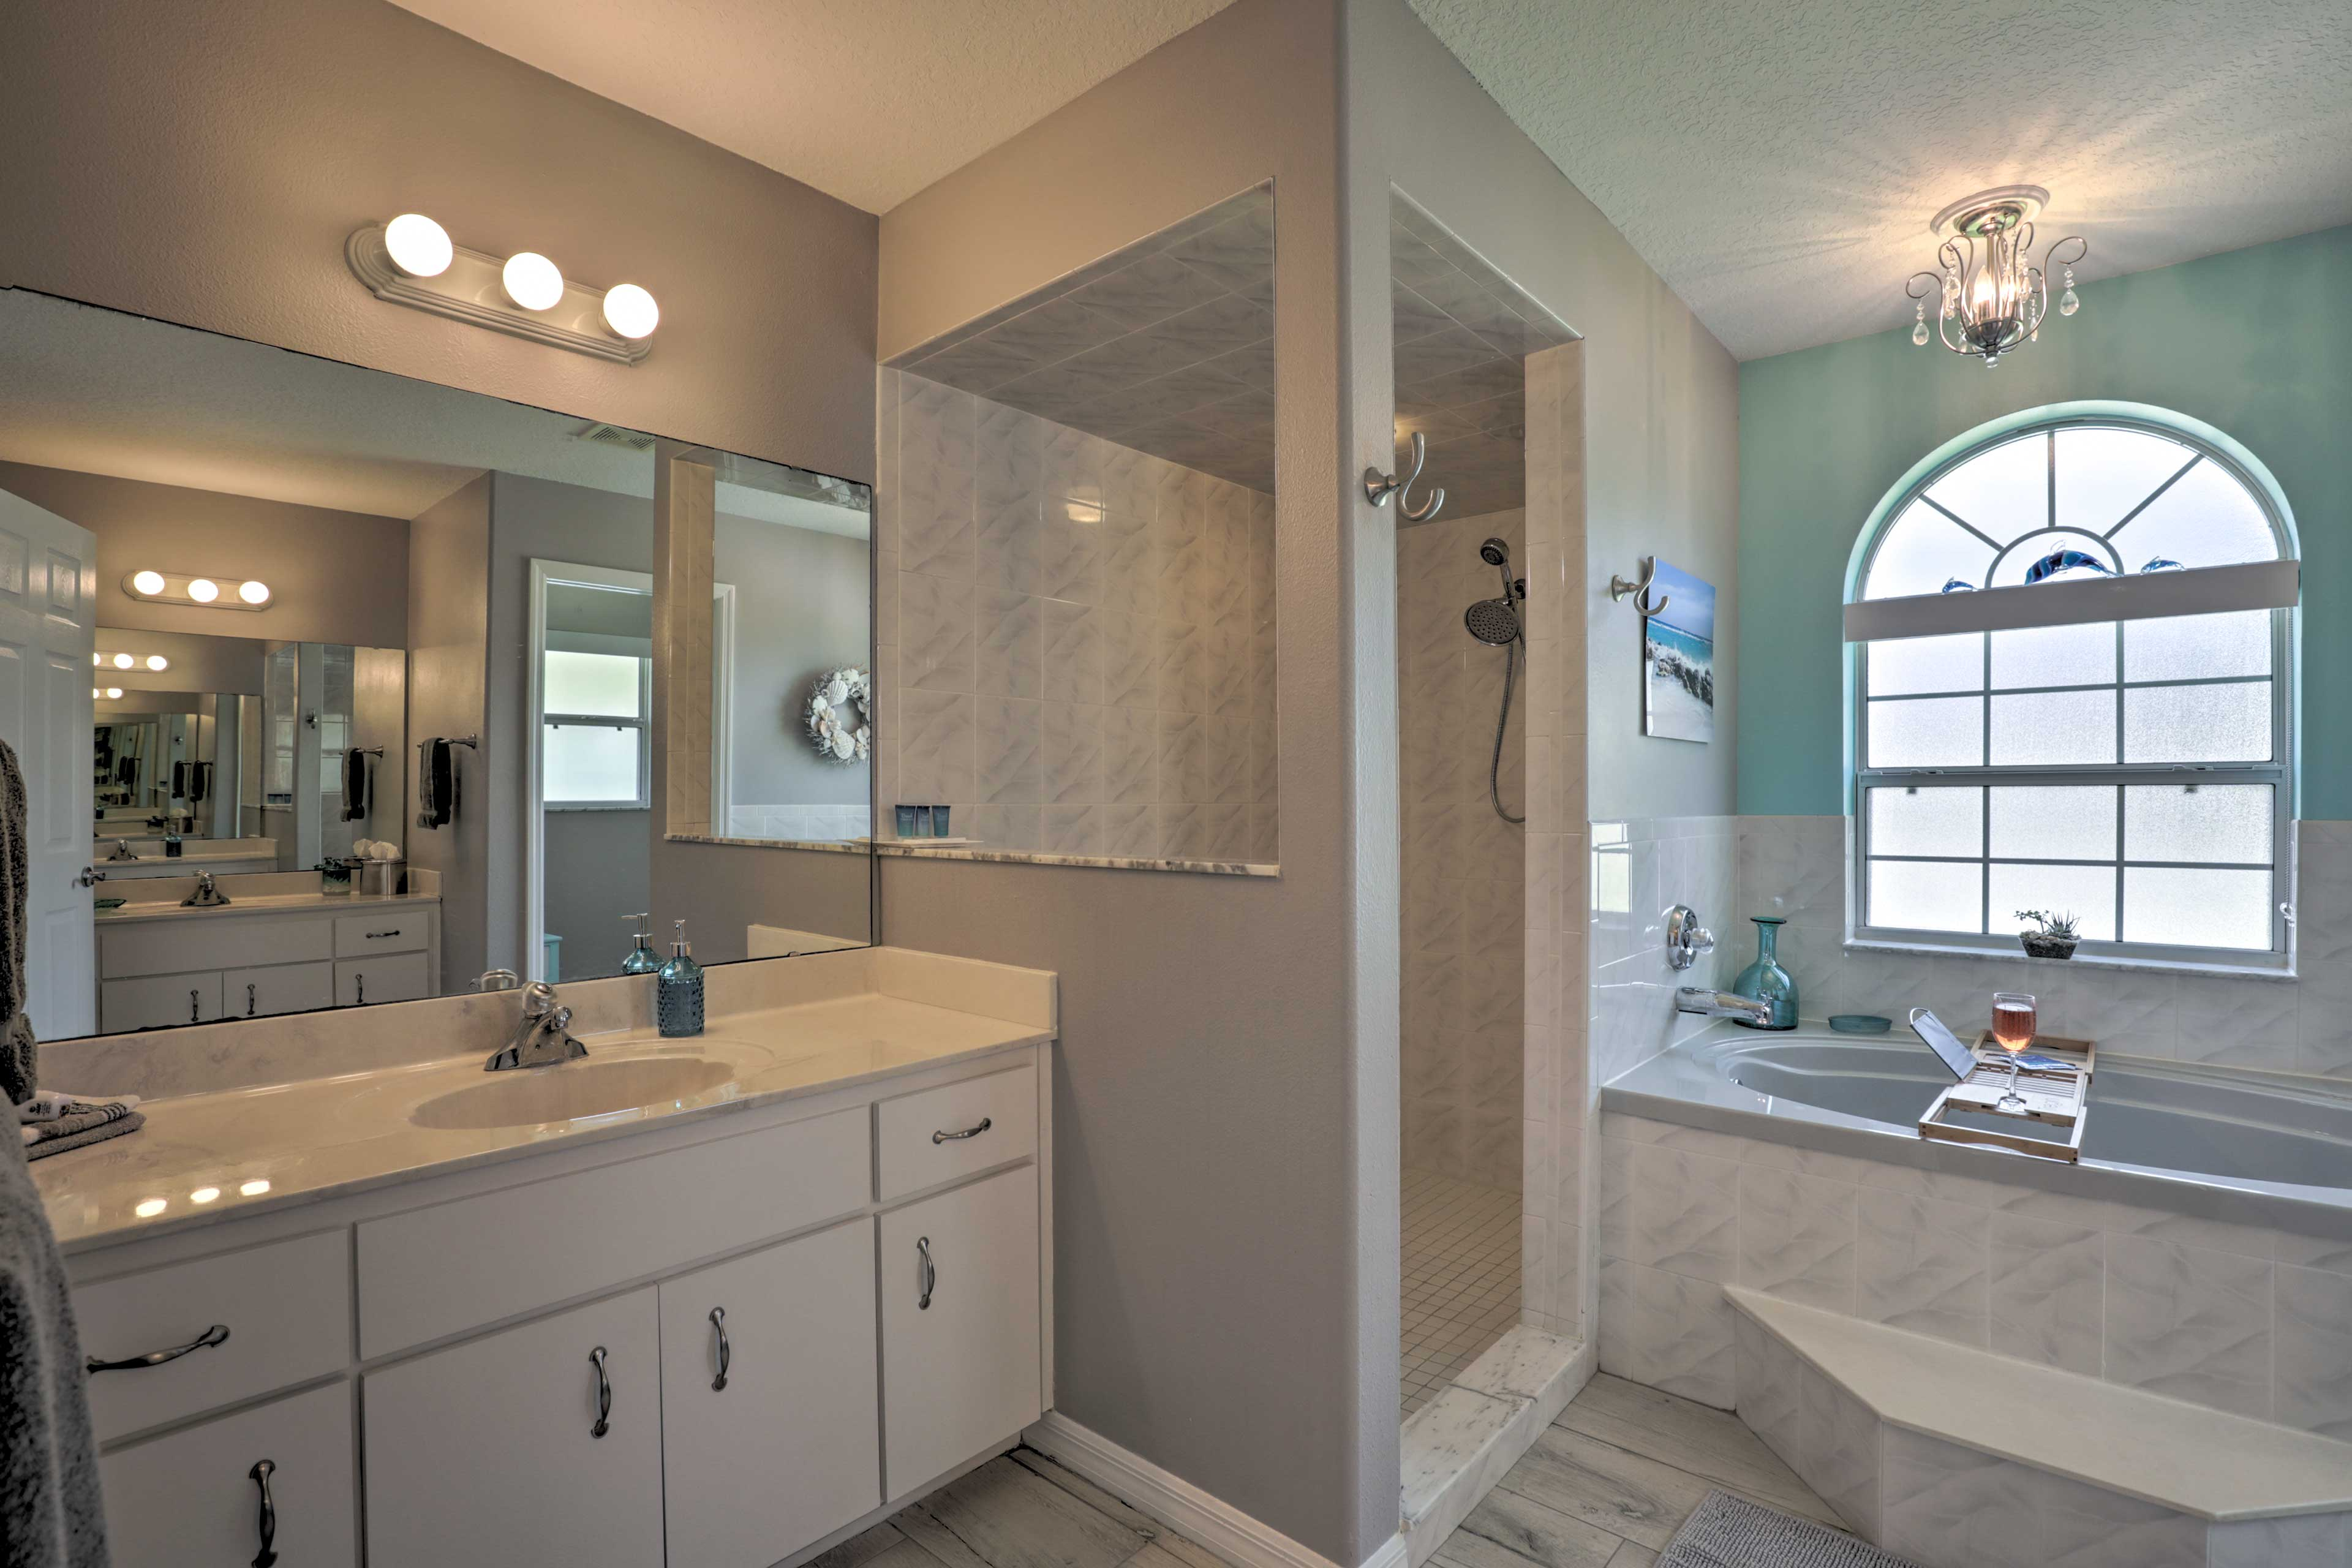 Rinse off in the en-suite's tile walk-in shower.